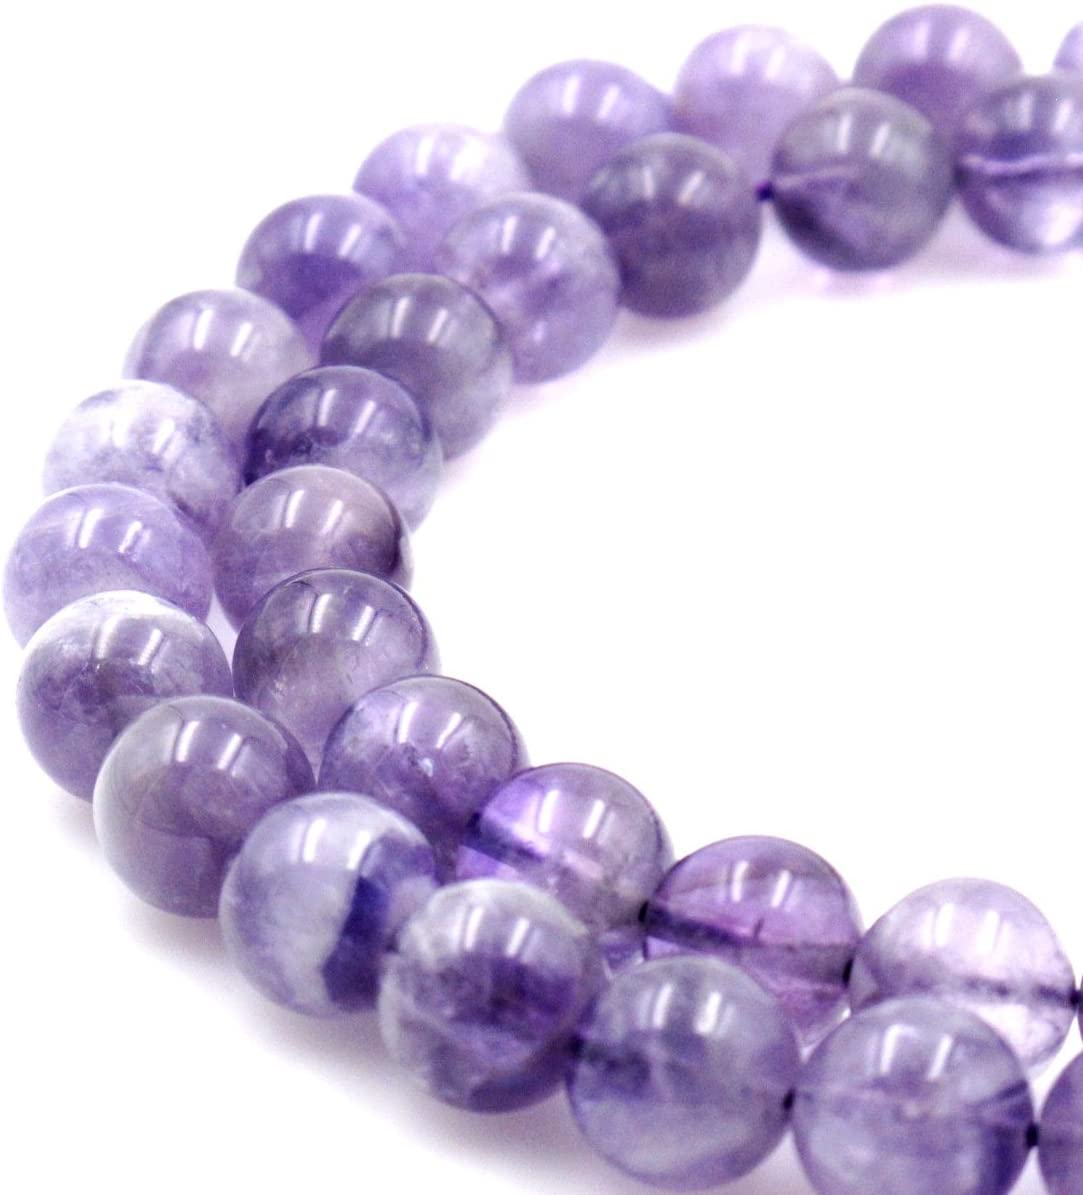 BRCbeads Natural Light Max 44% OFF Purple Ranking TOP13 Amethyst Round Loose Bead Gemstone